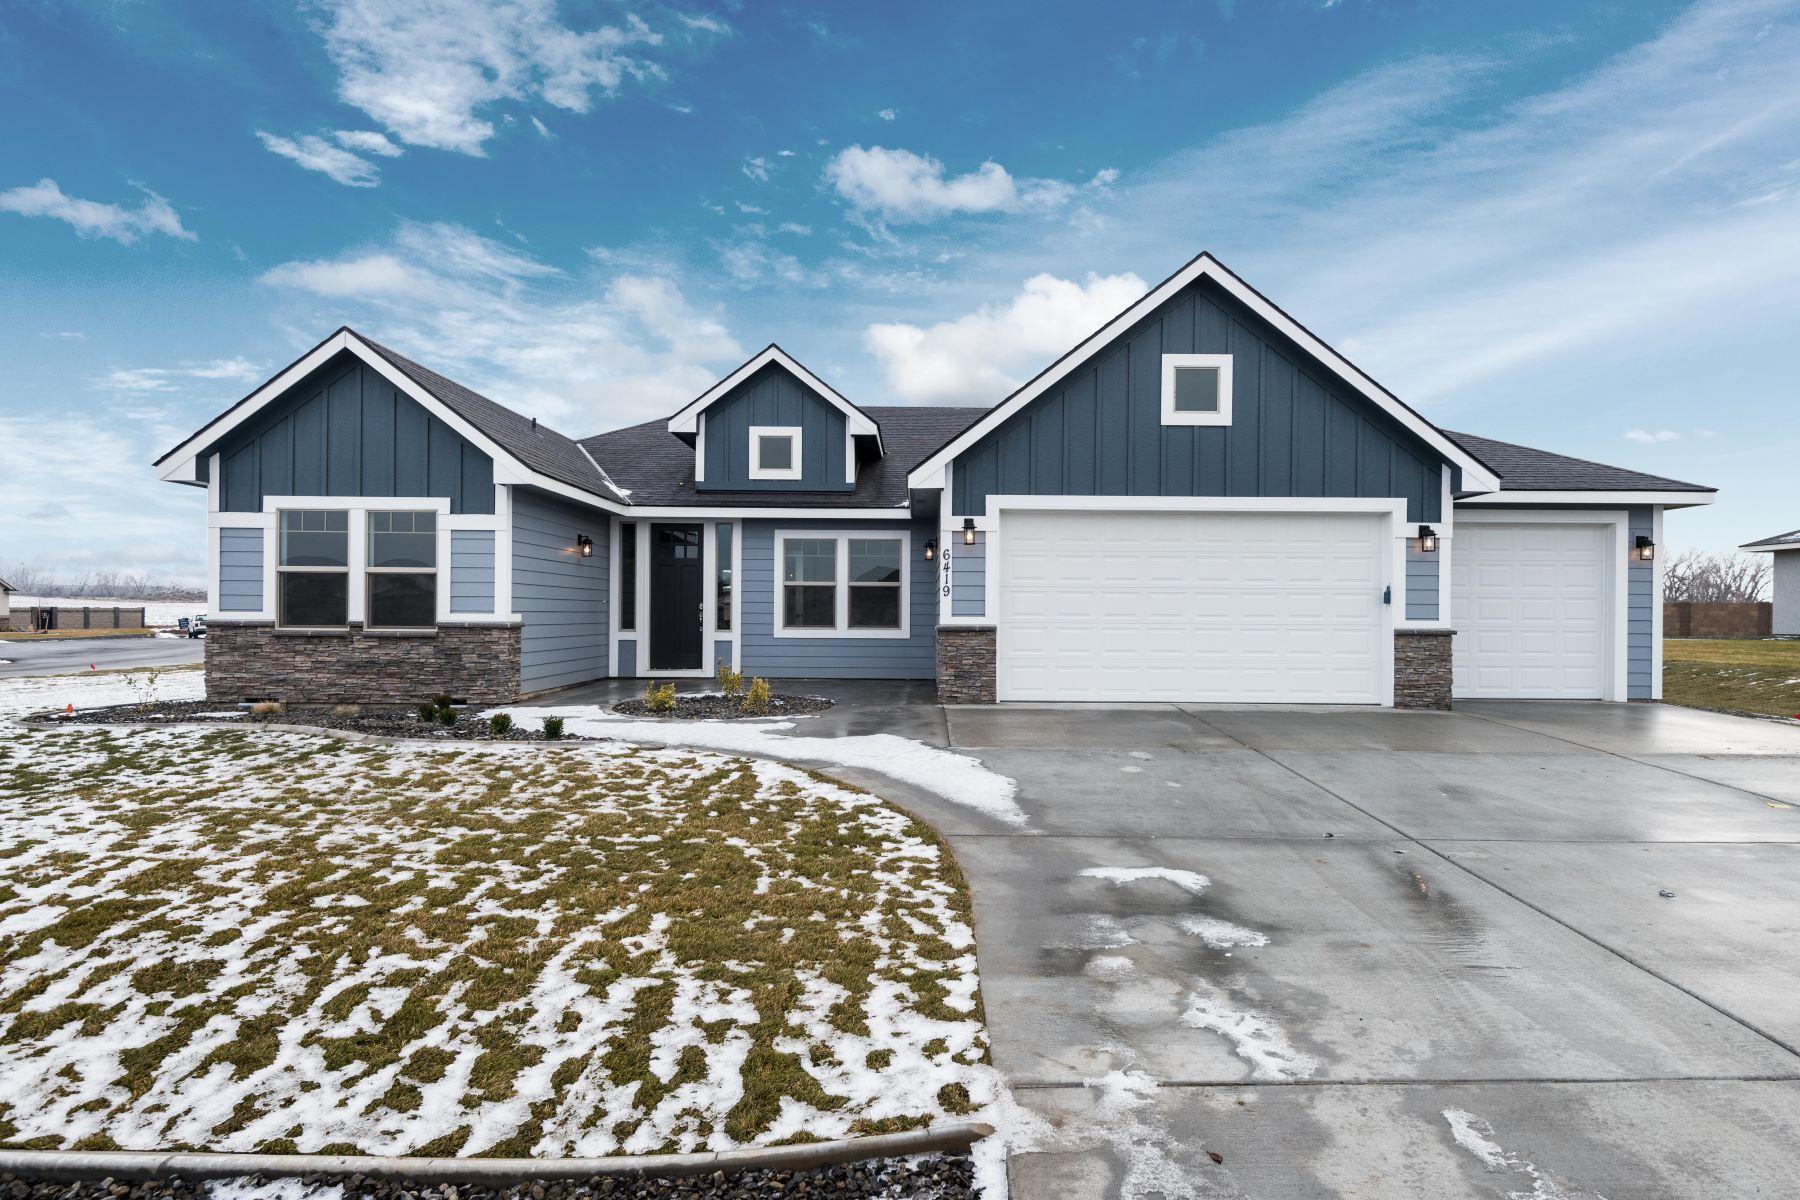 واحد منزل الأسرة للـ Sale في The Richmond by Riverwood Homes 6718 Sandy Ridge, Pasco, Washington, 99301 United States